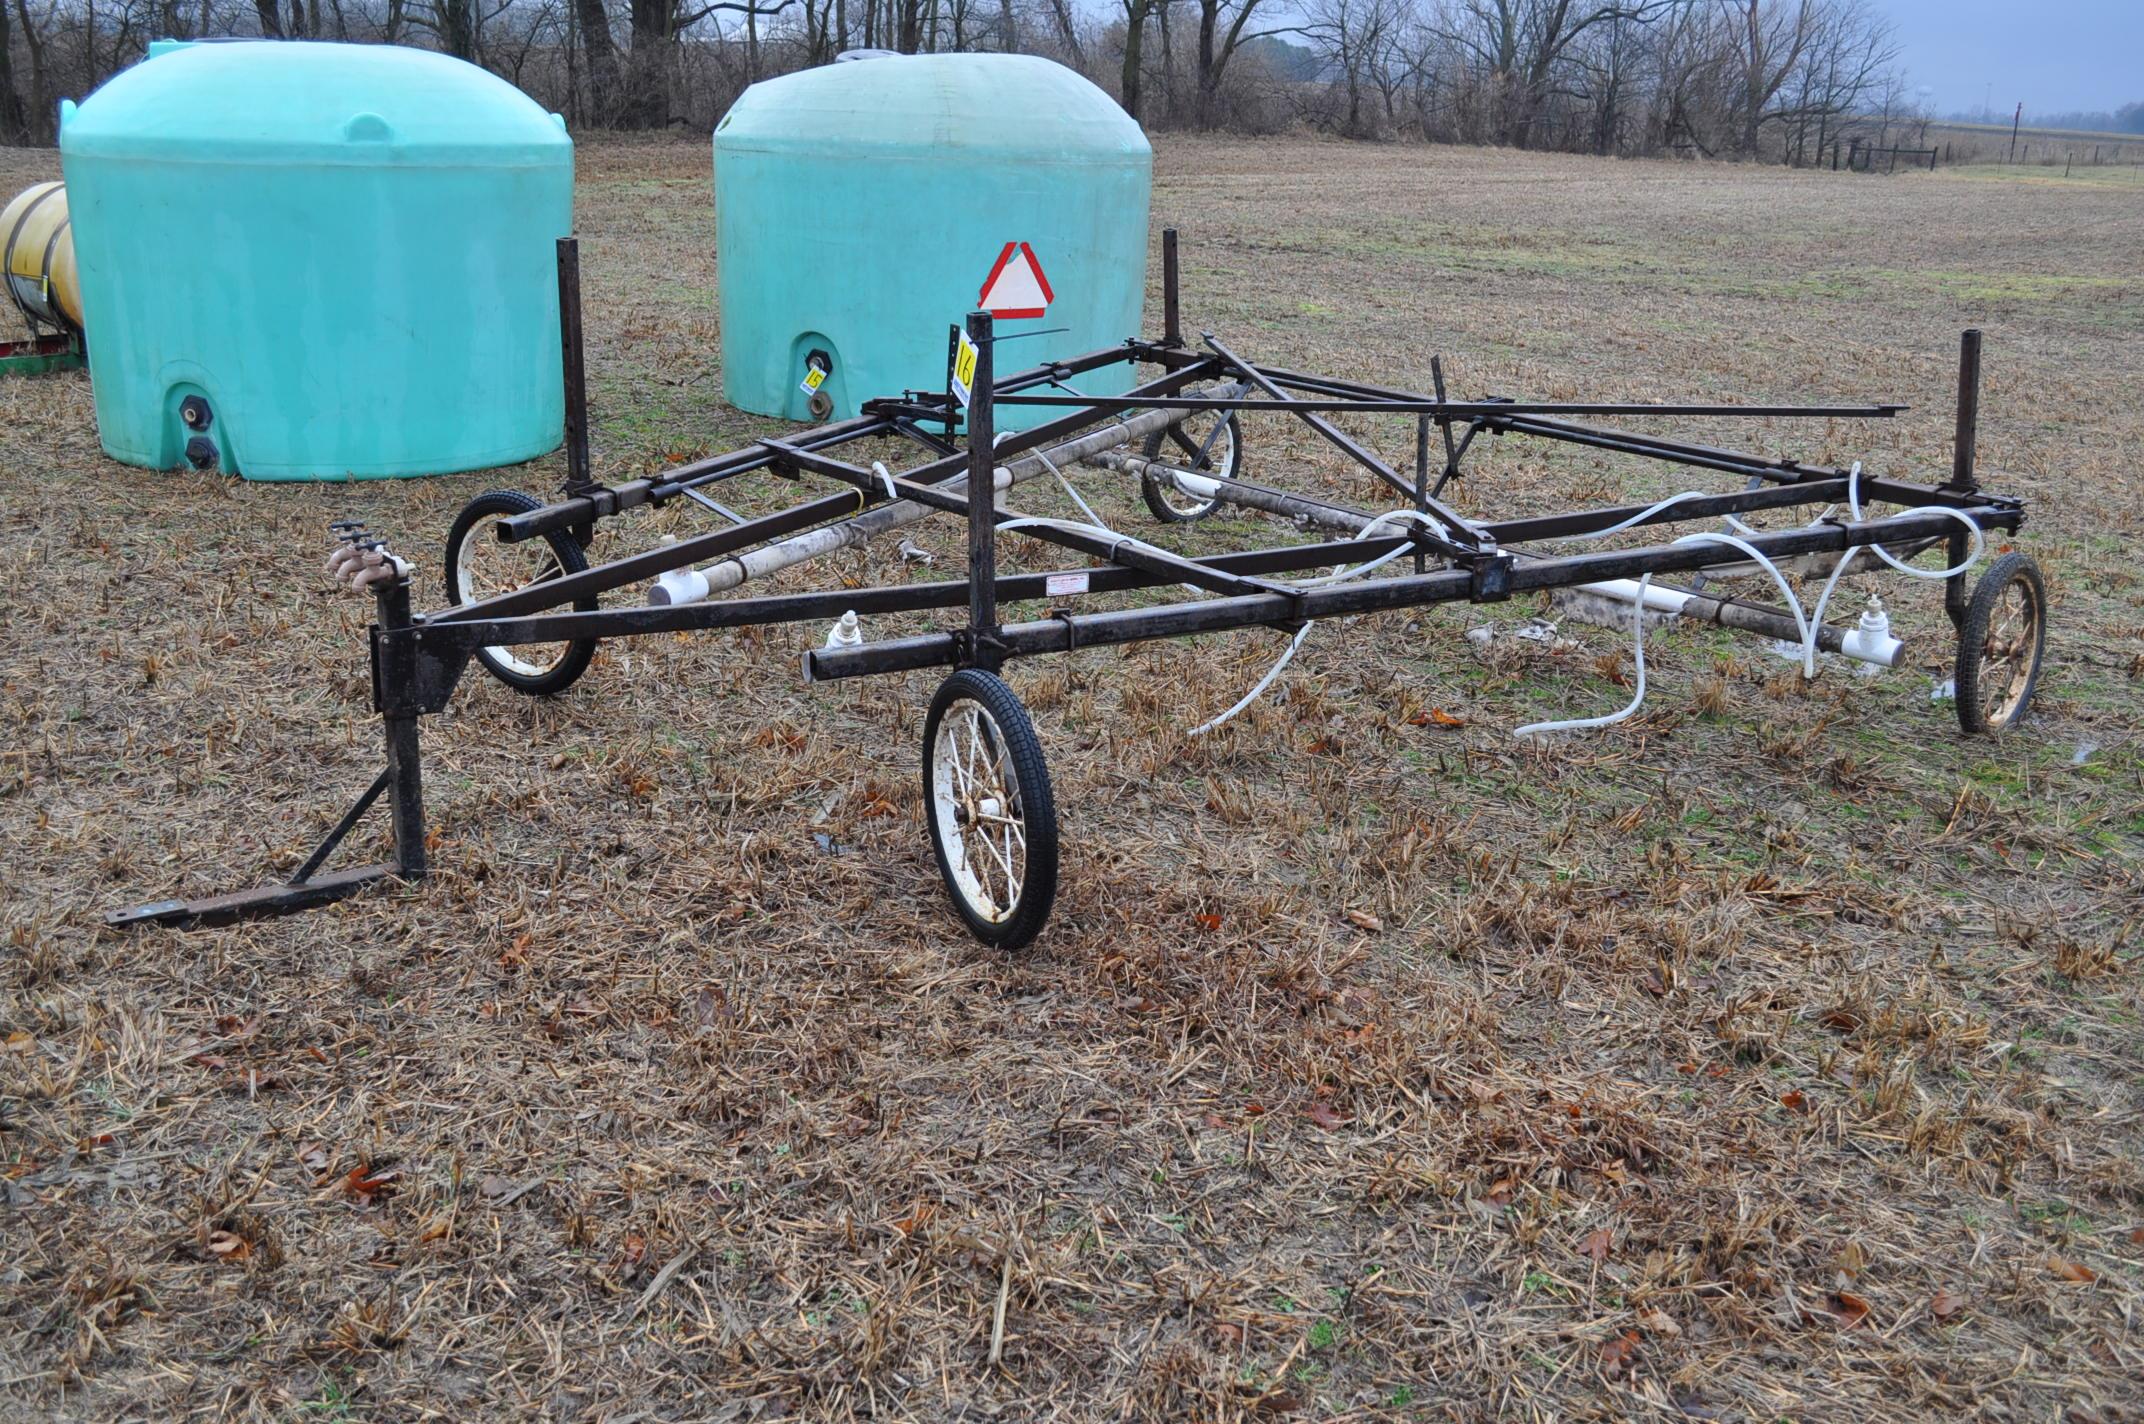 30' Quality Metal Works weed wiper cart, needs work